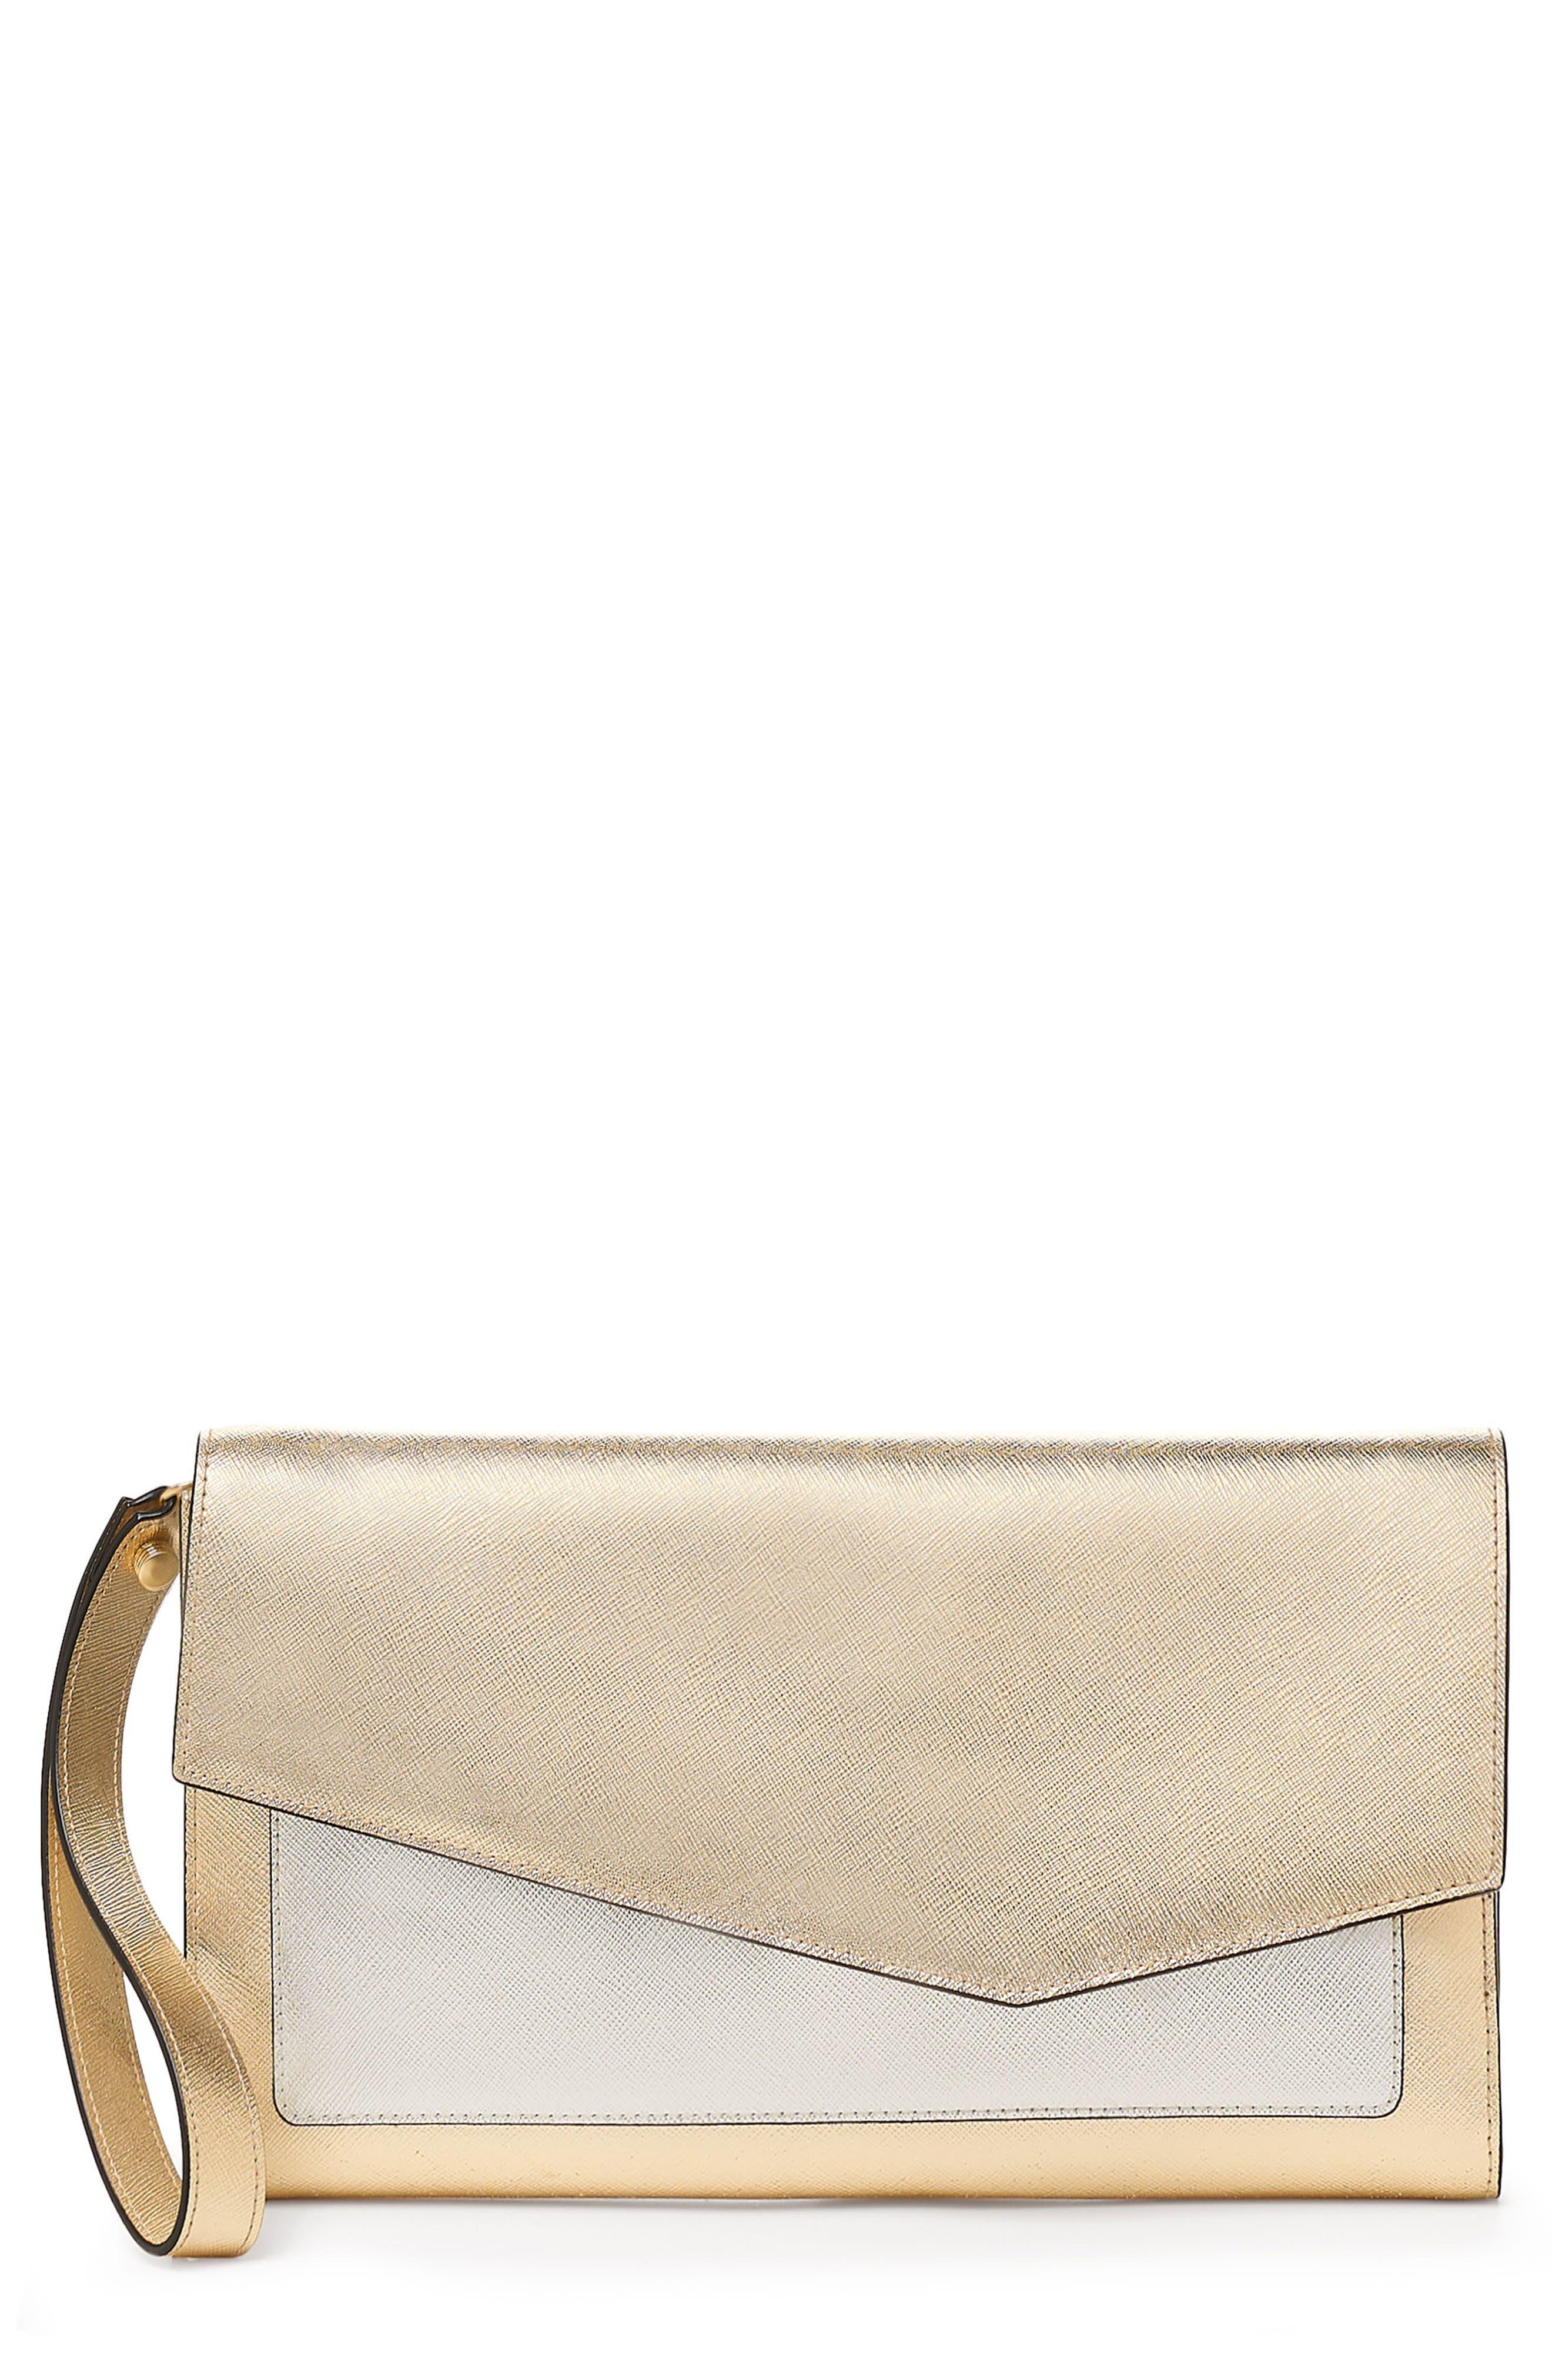 Cobble Hill Leather Wallet,                         Main,                         color, GOLD COLORBLOCK